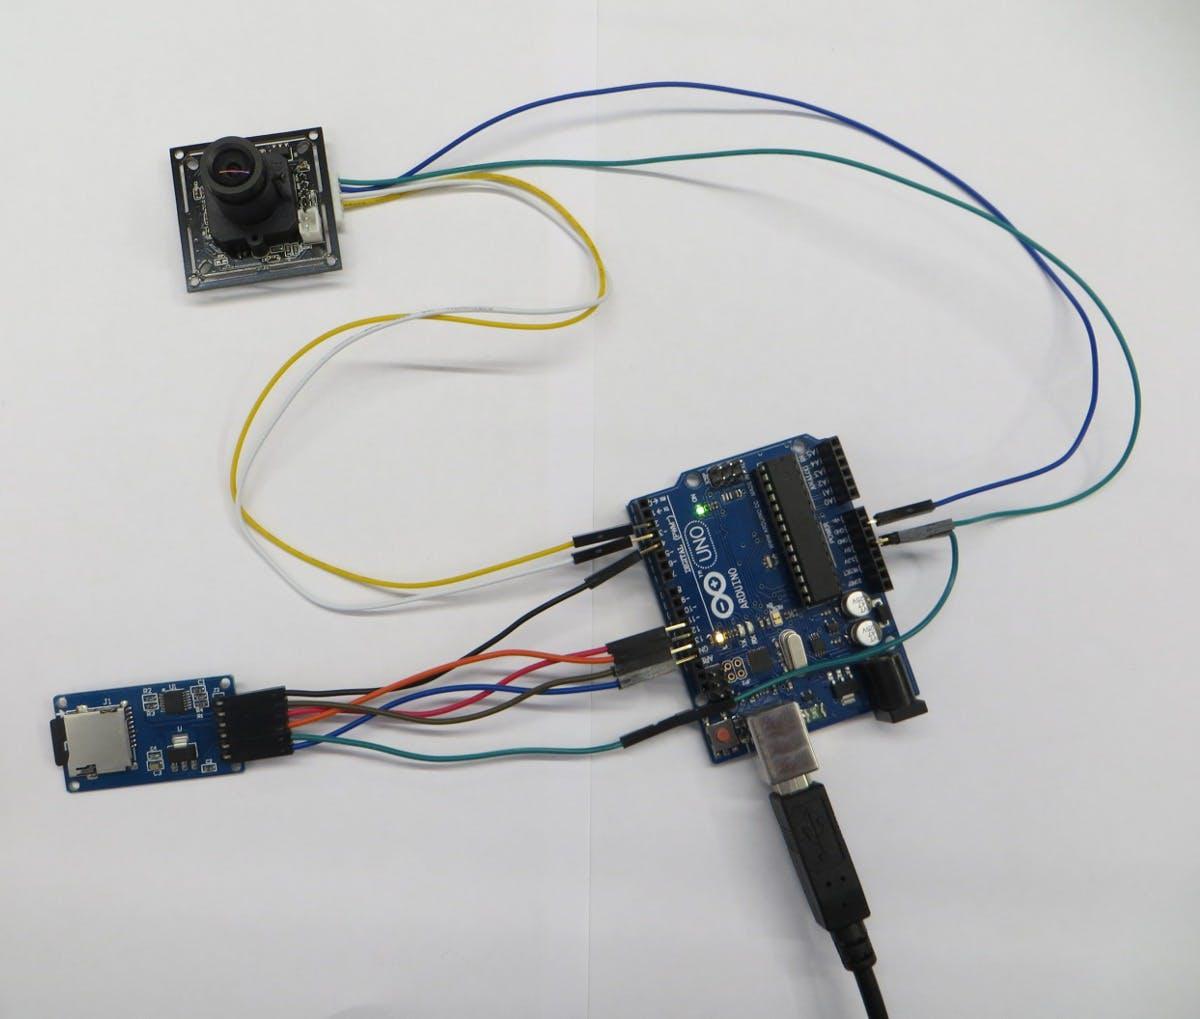 Figure 14. Test Camera and misroSD card.